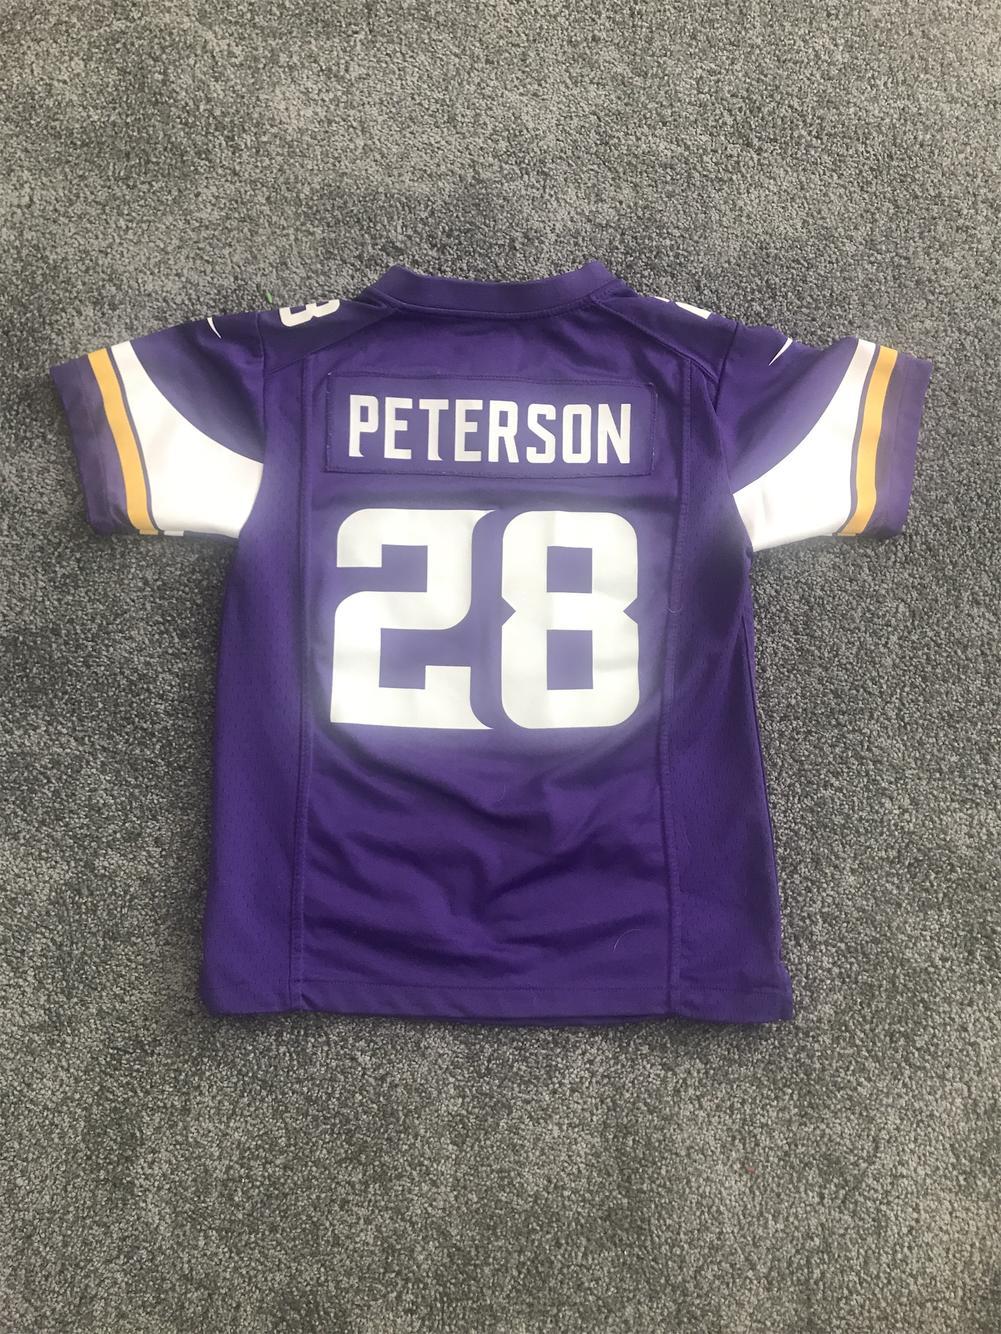 Youth Medium Vikings Adrian Peterson Jersey